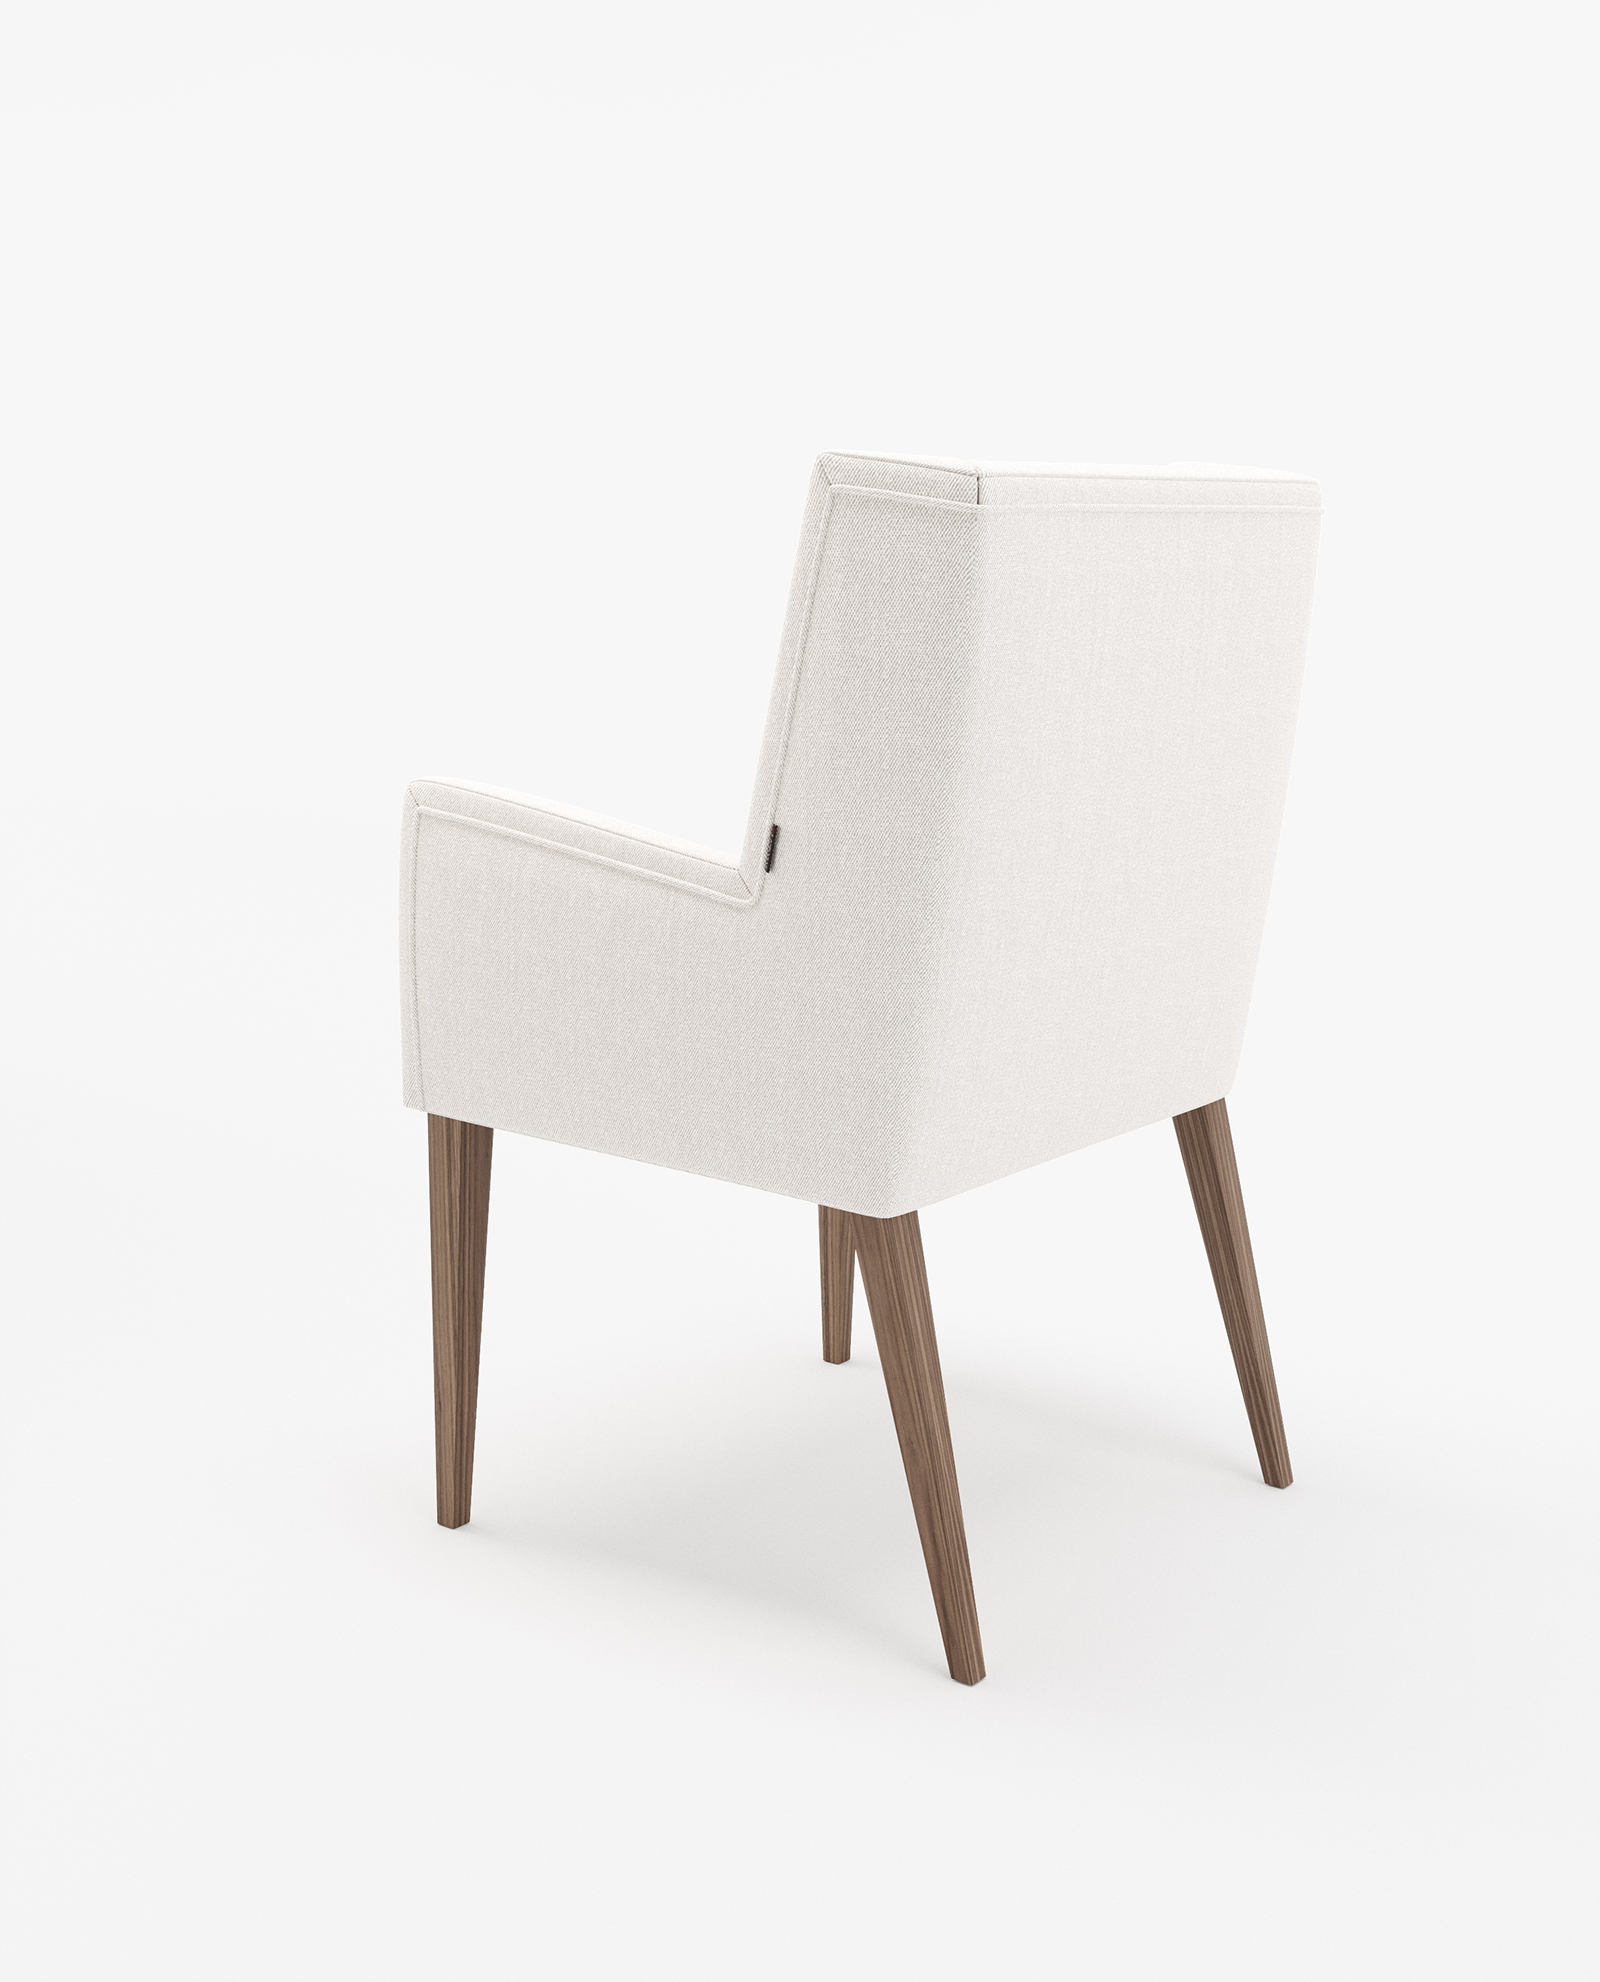 cadeira-bracos-perola-nogueira (4)